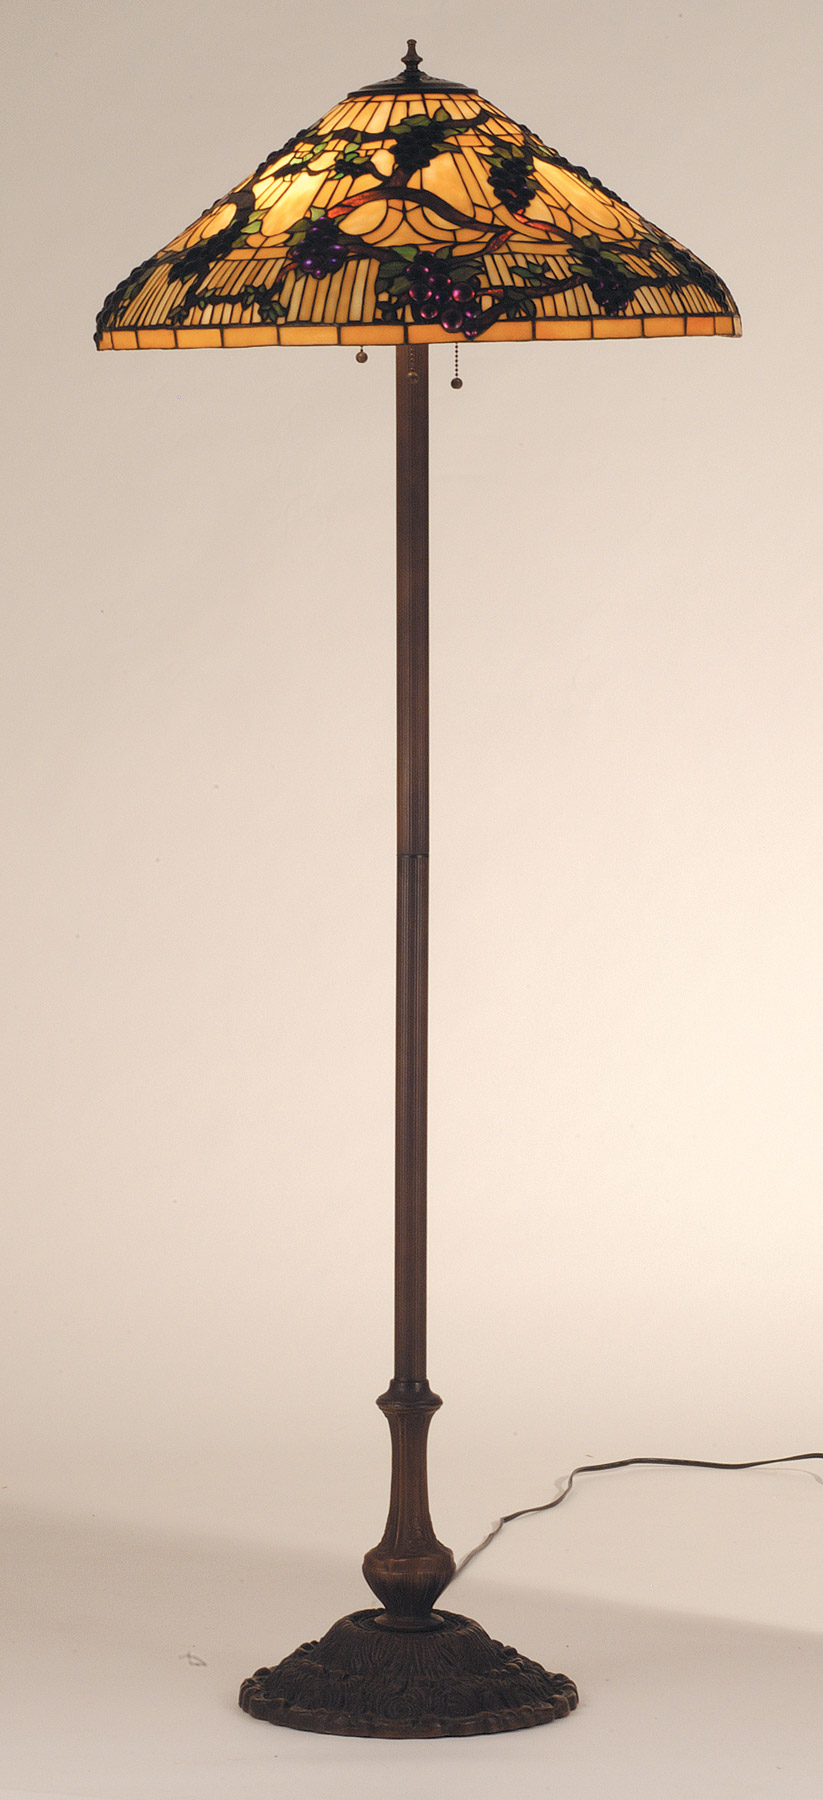 Meyda 55961 Tiffany Jeweled Grape Floor Lamp